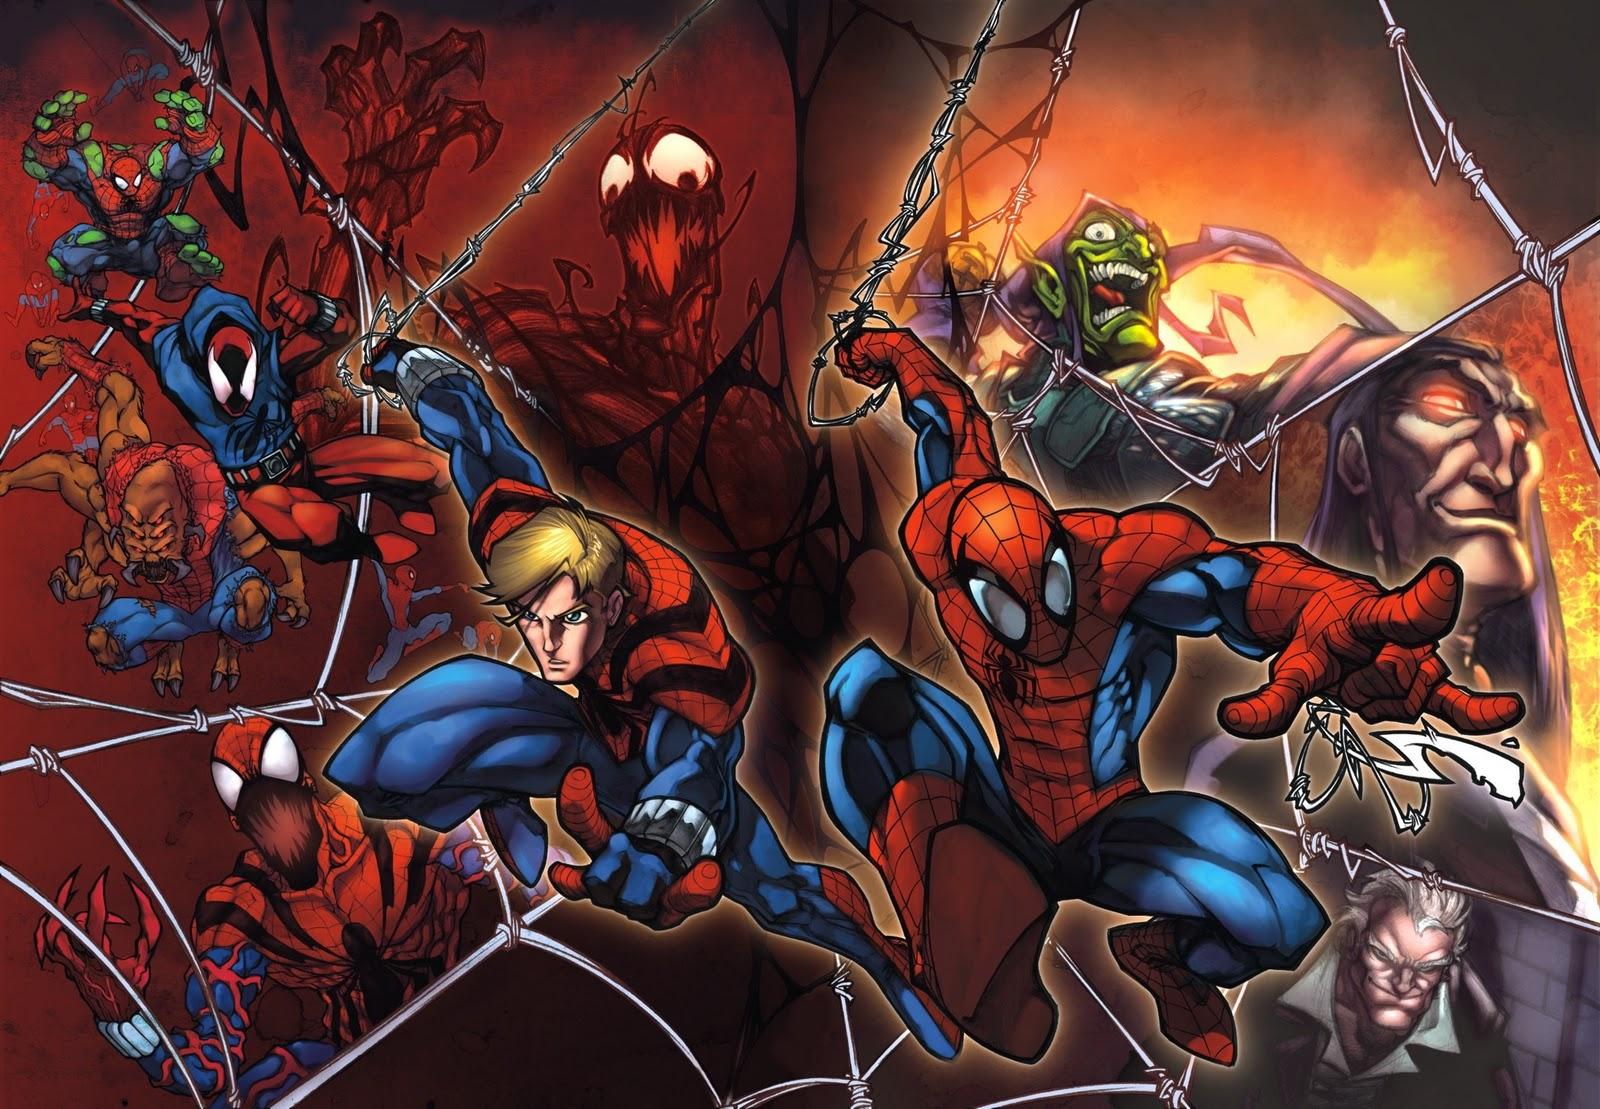 http://1.bp.blogspot.com/__fsDGnEU74M/TKfG0hPFwPI/AAAAAAAAABs/3KeTSMh4MA8/s1600/frank-cho-spider-man.jpg